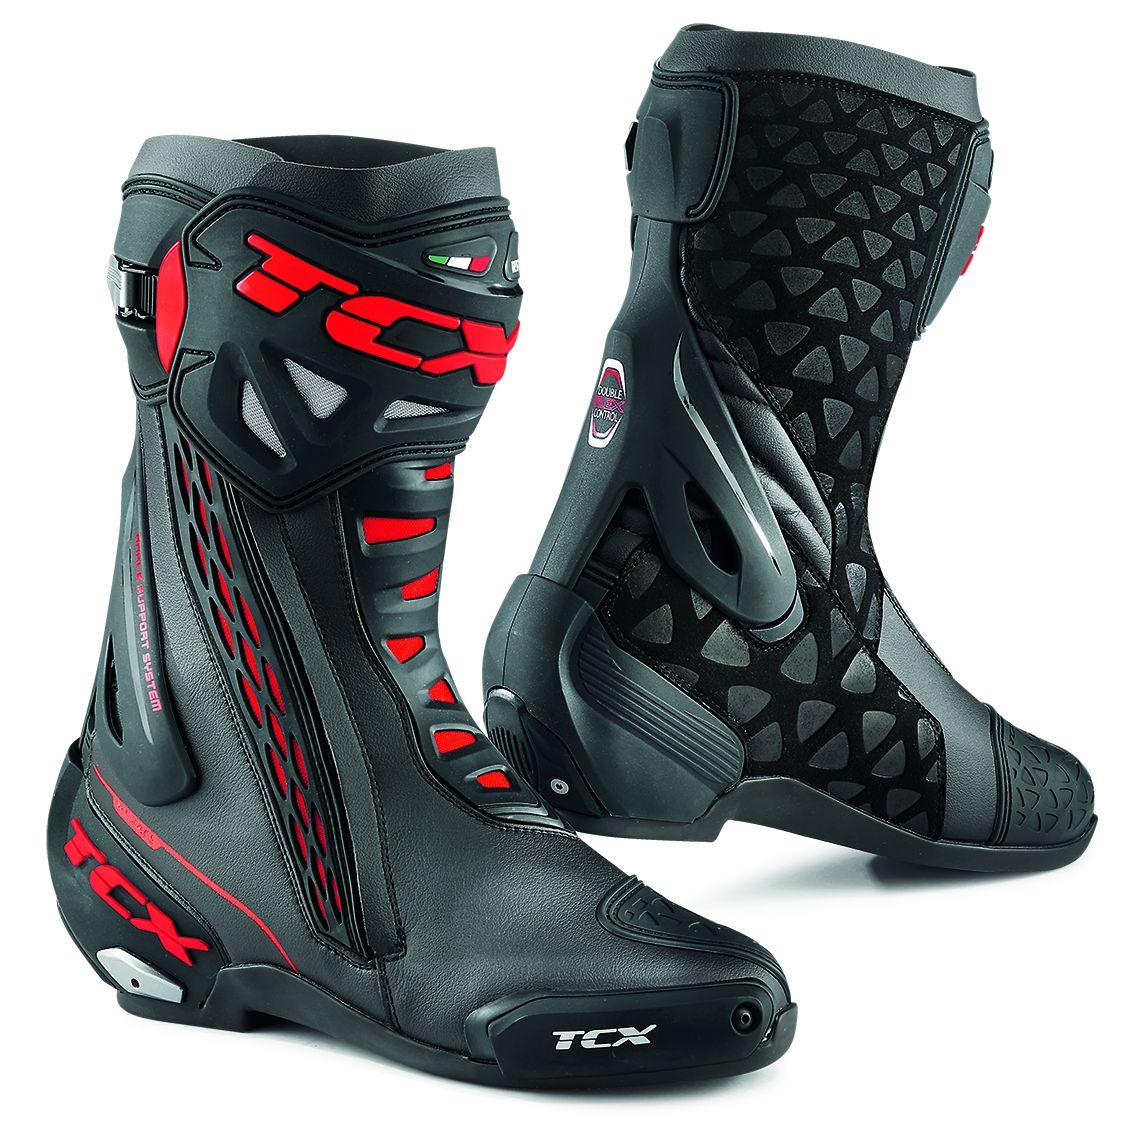 Bottes TCX Boots RT RACE